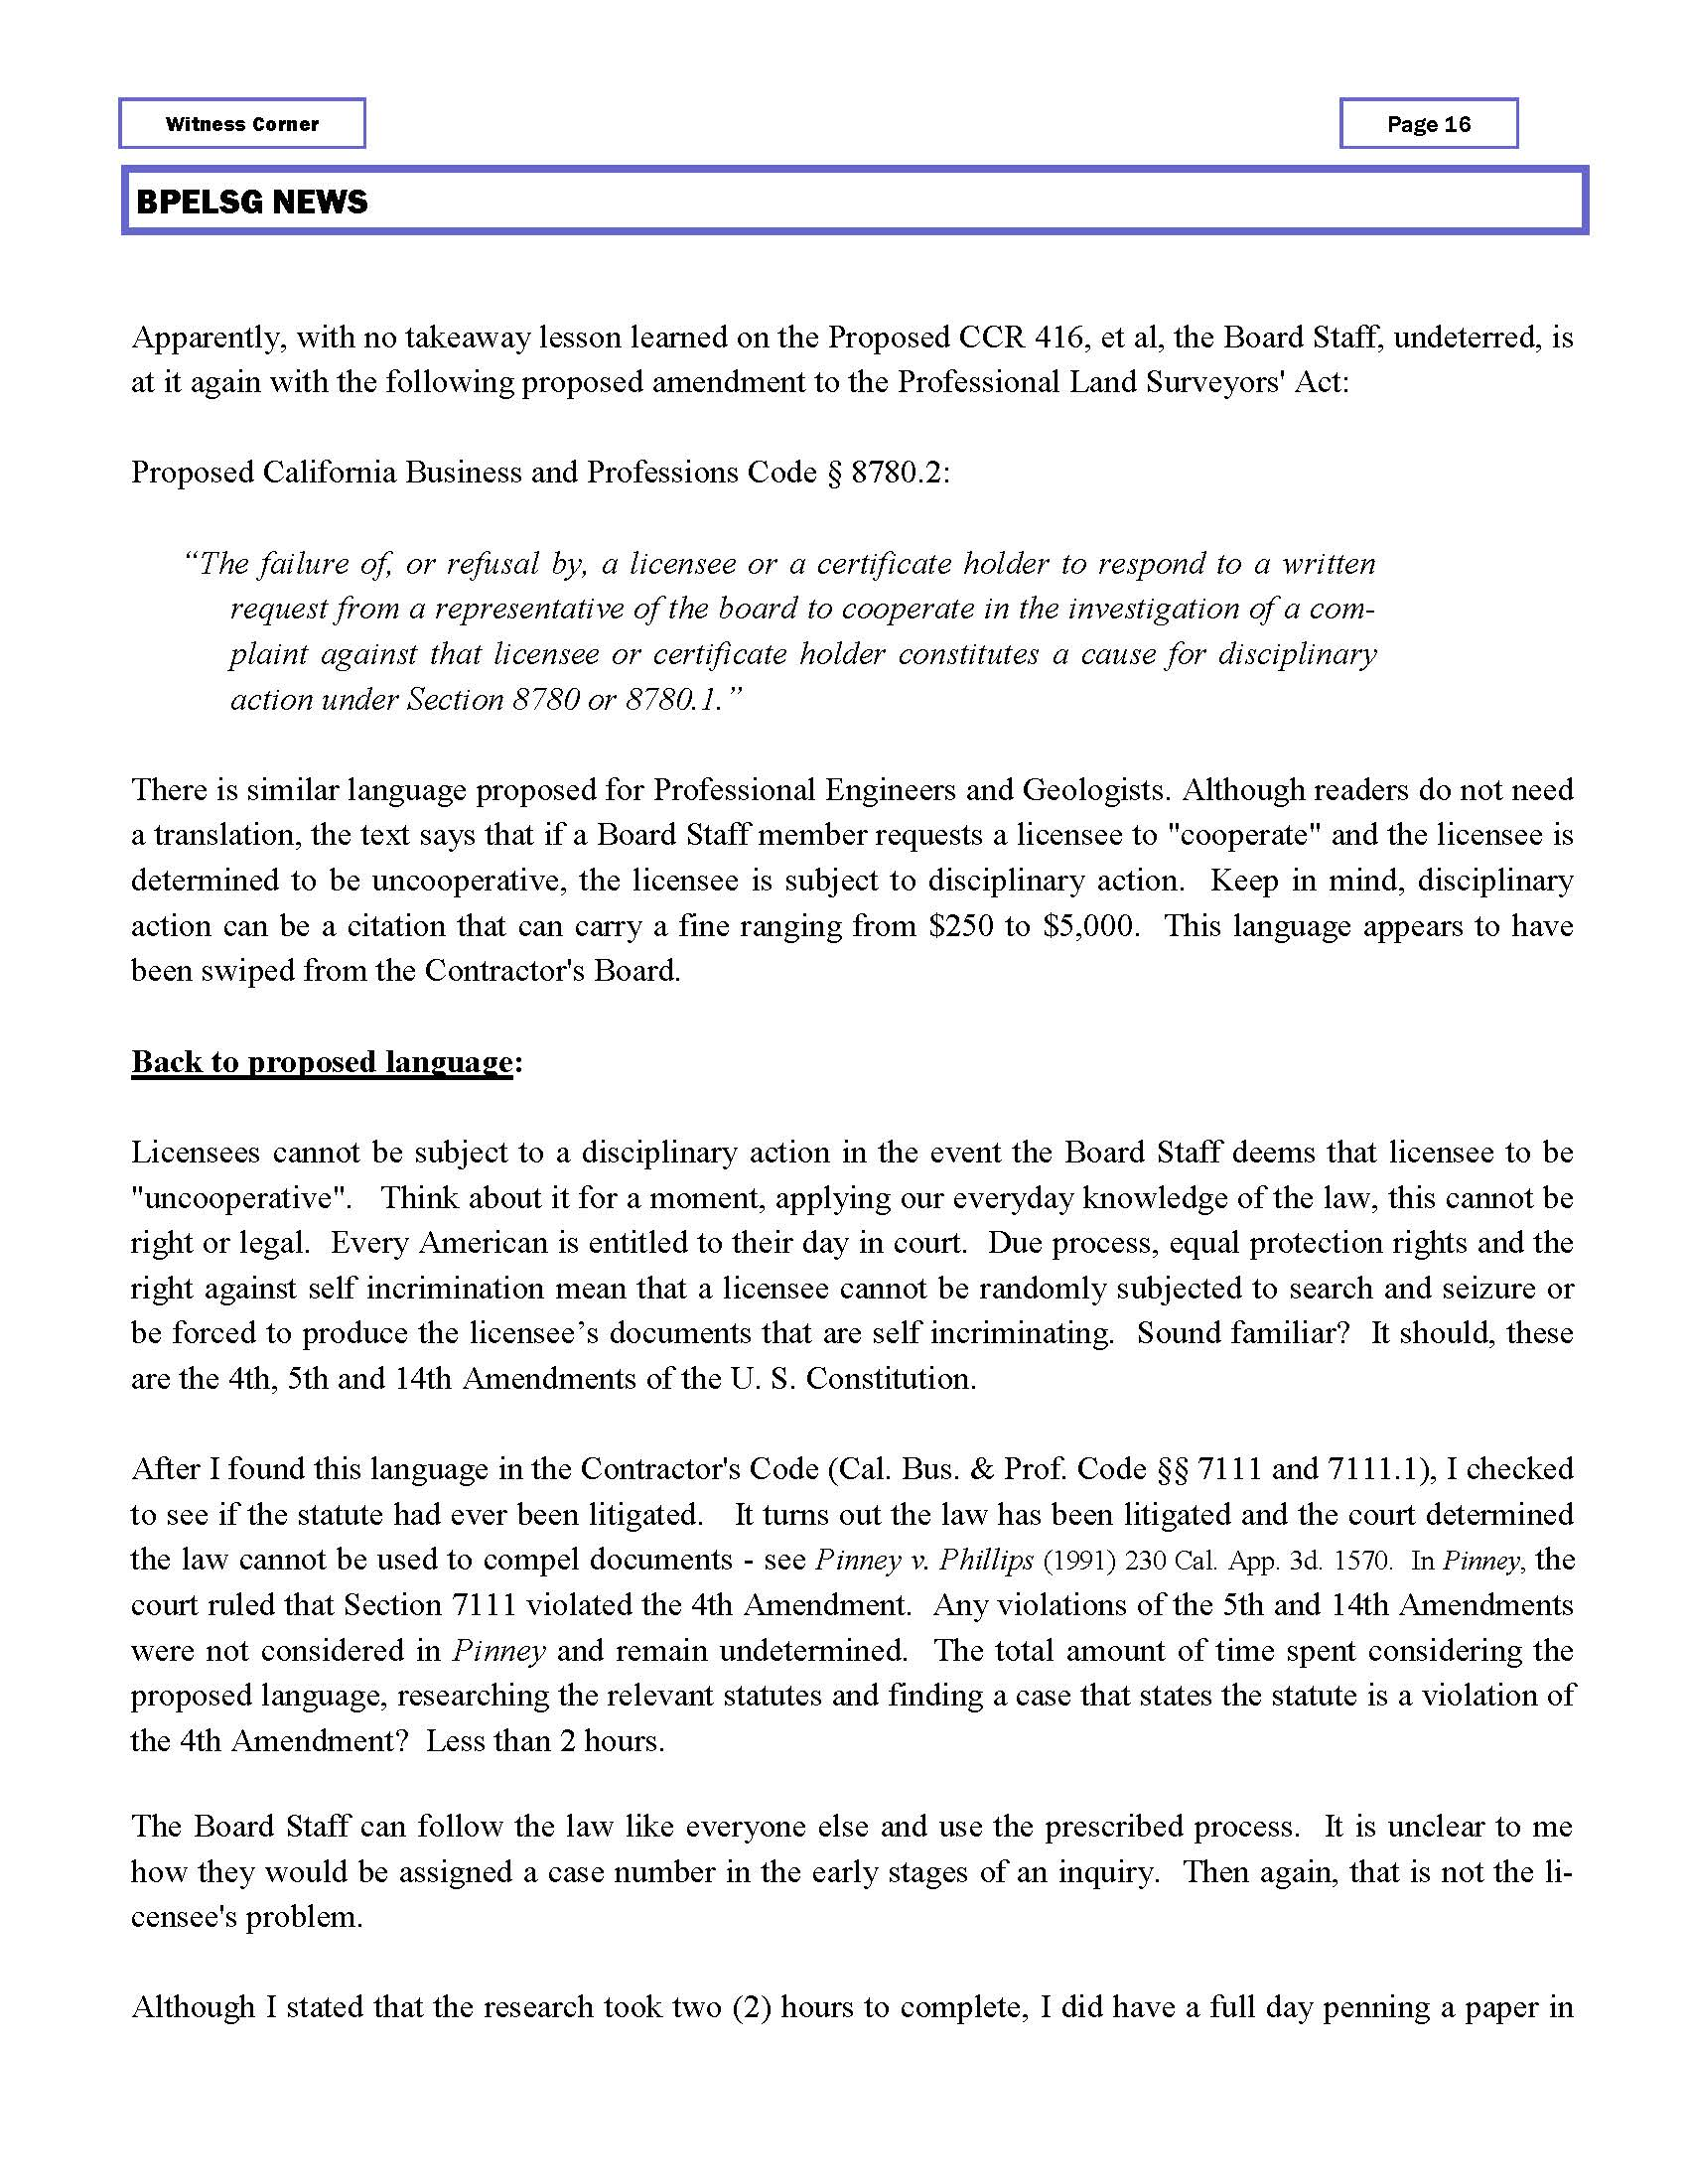 OC-CLSA 082015 Newsletter_Page_19.jpg